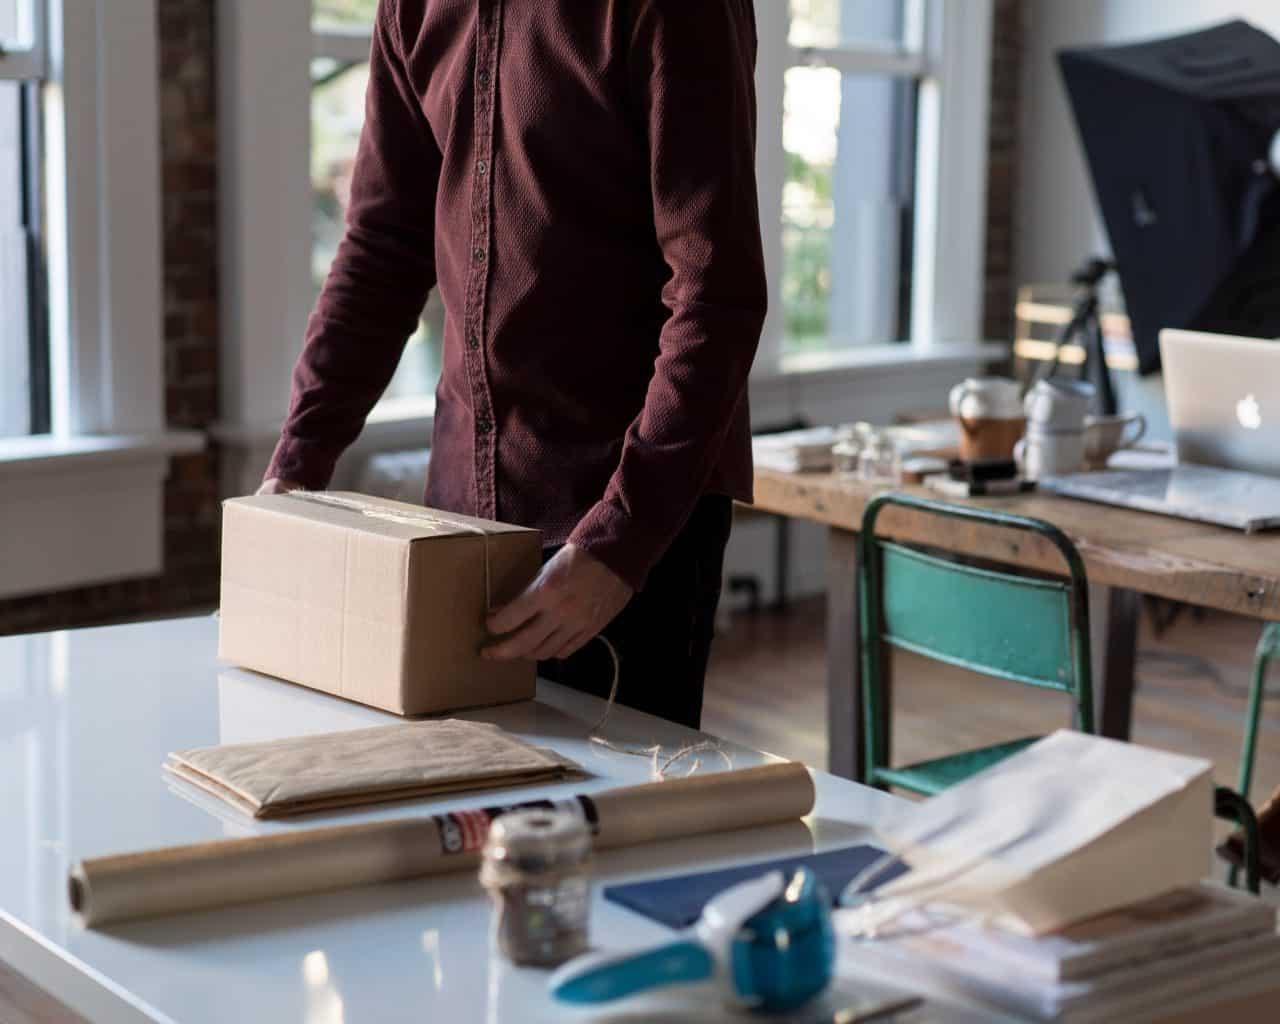 How to Make Money on Amazon FBA with Retail Arbitrage?